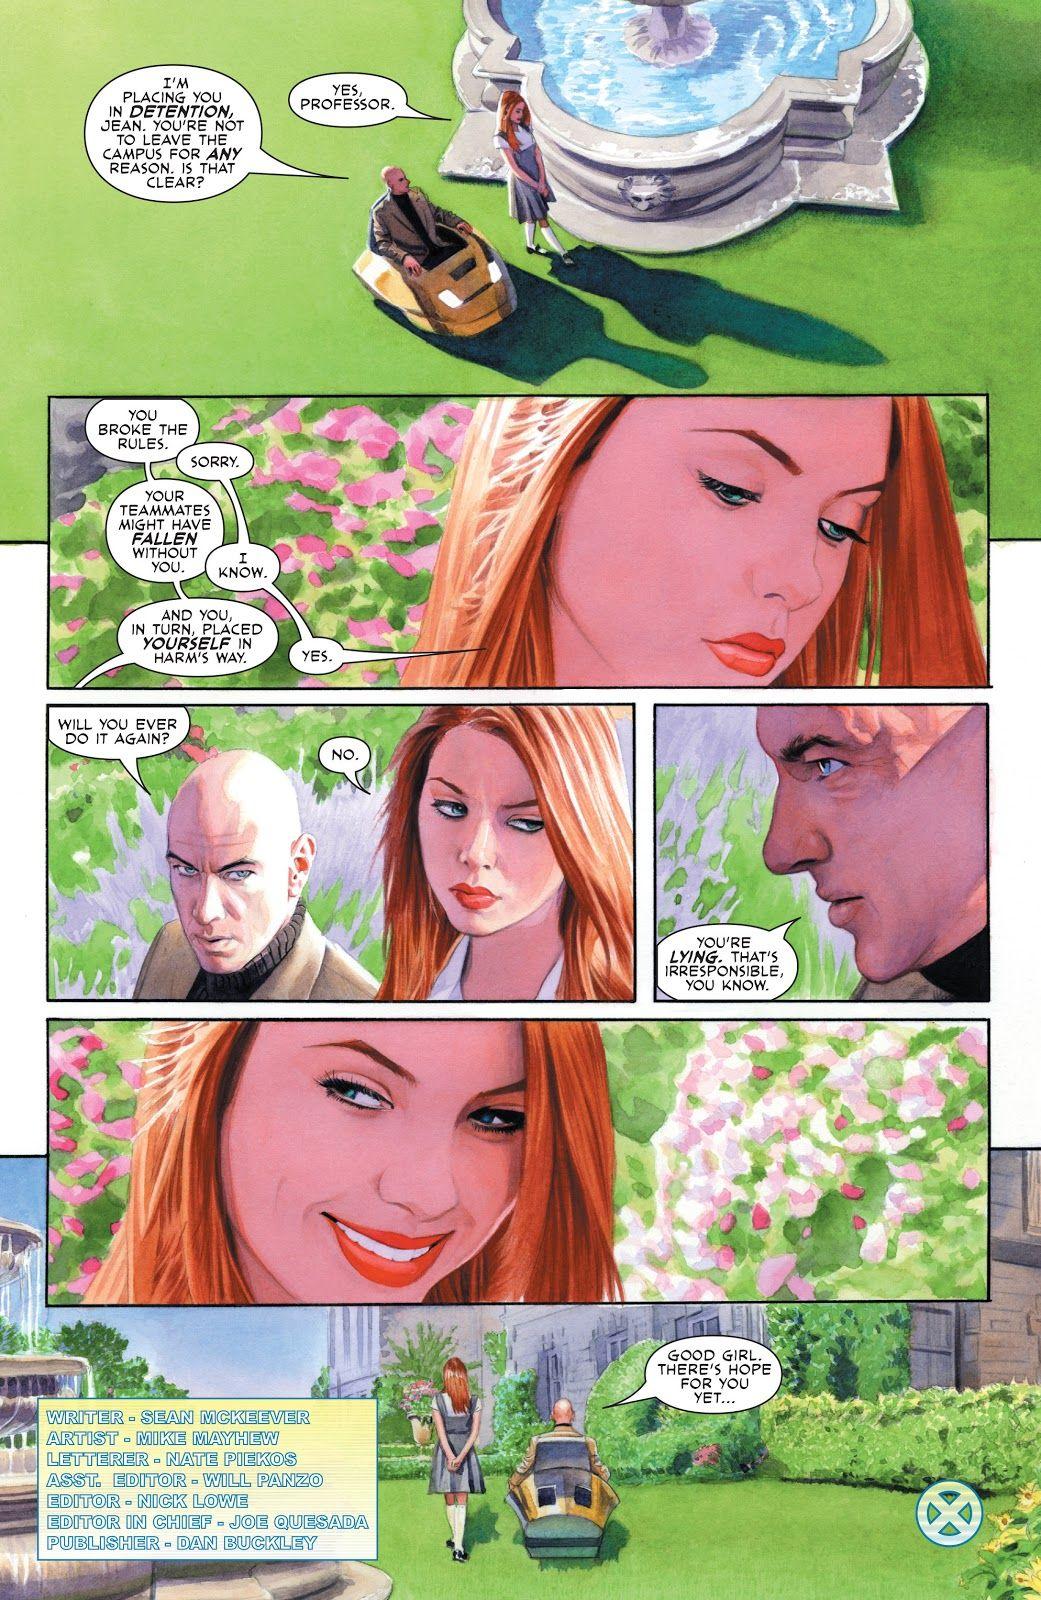 X Men Origins Jean Grey Full Read X Men Origins Jean Grey Full Comic Online In High Quality Female Comic Characters Marvel Girls Jean Grey Phoenix